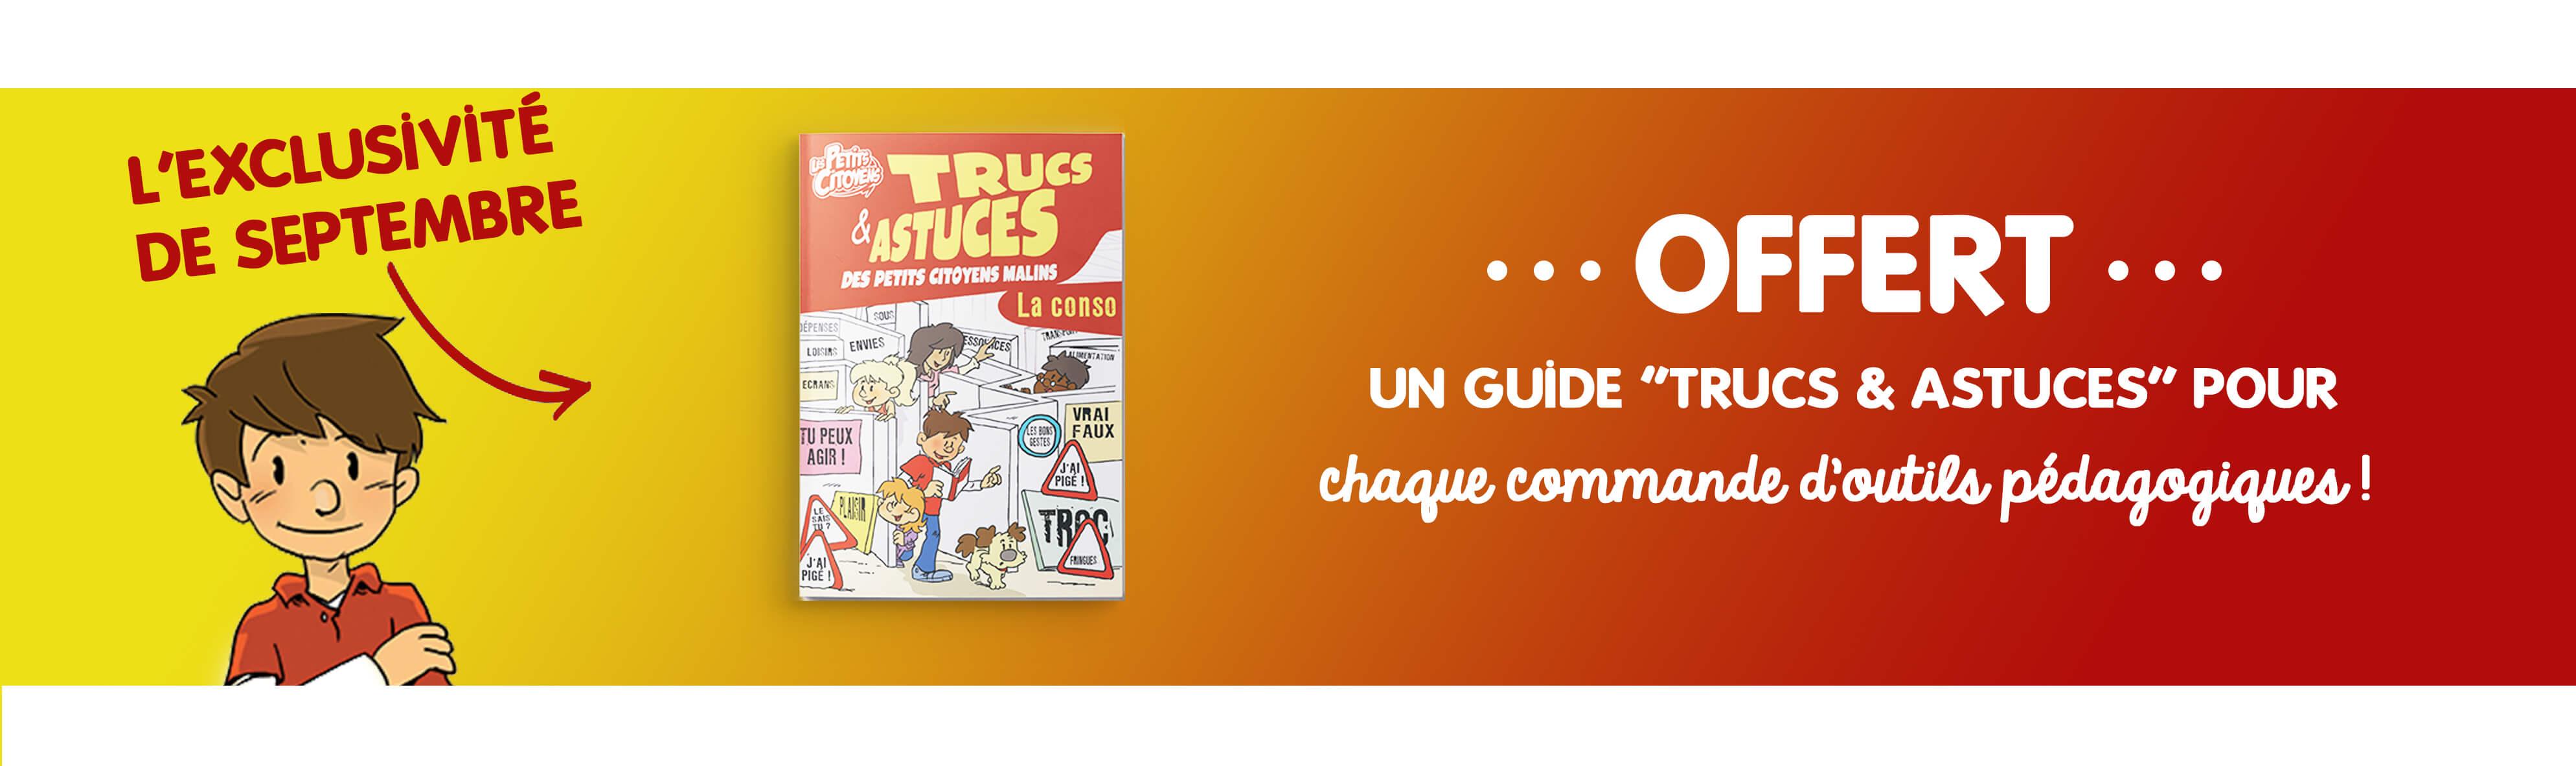 guide_conso_offert_septembre